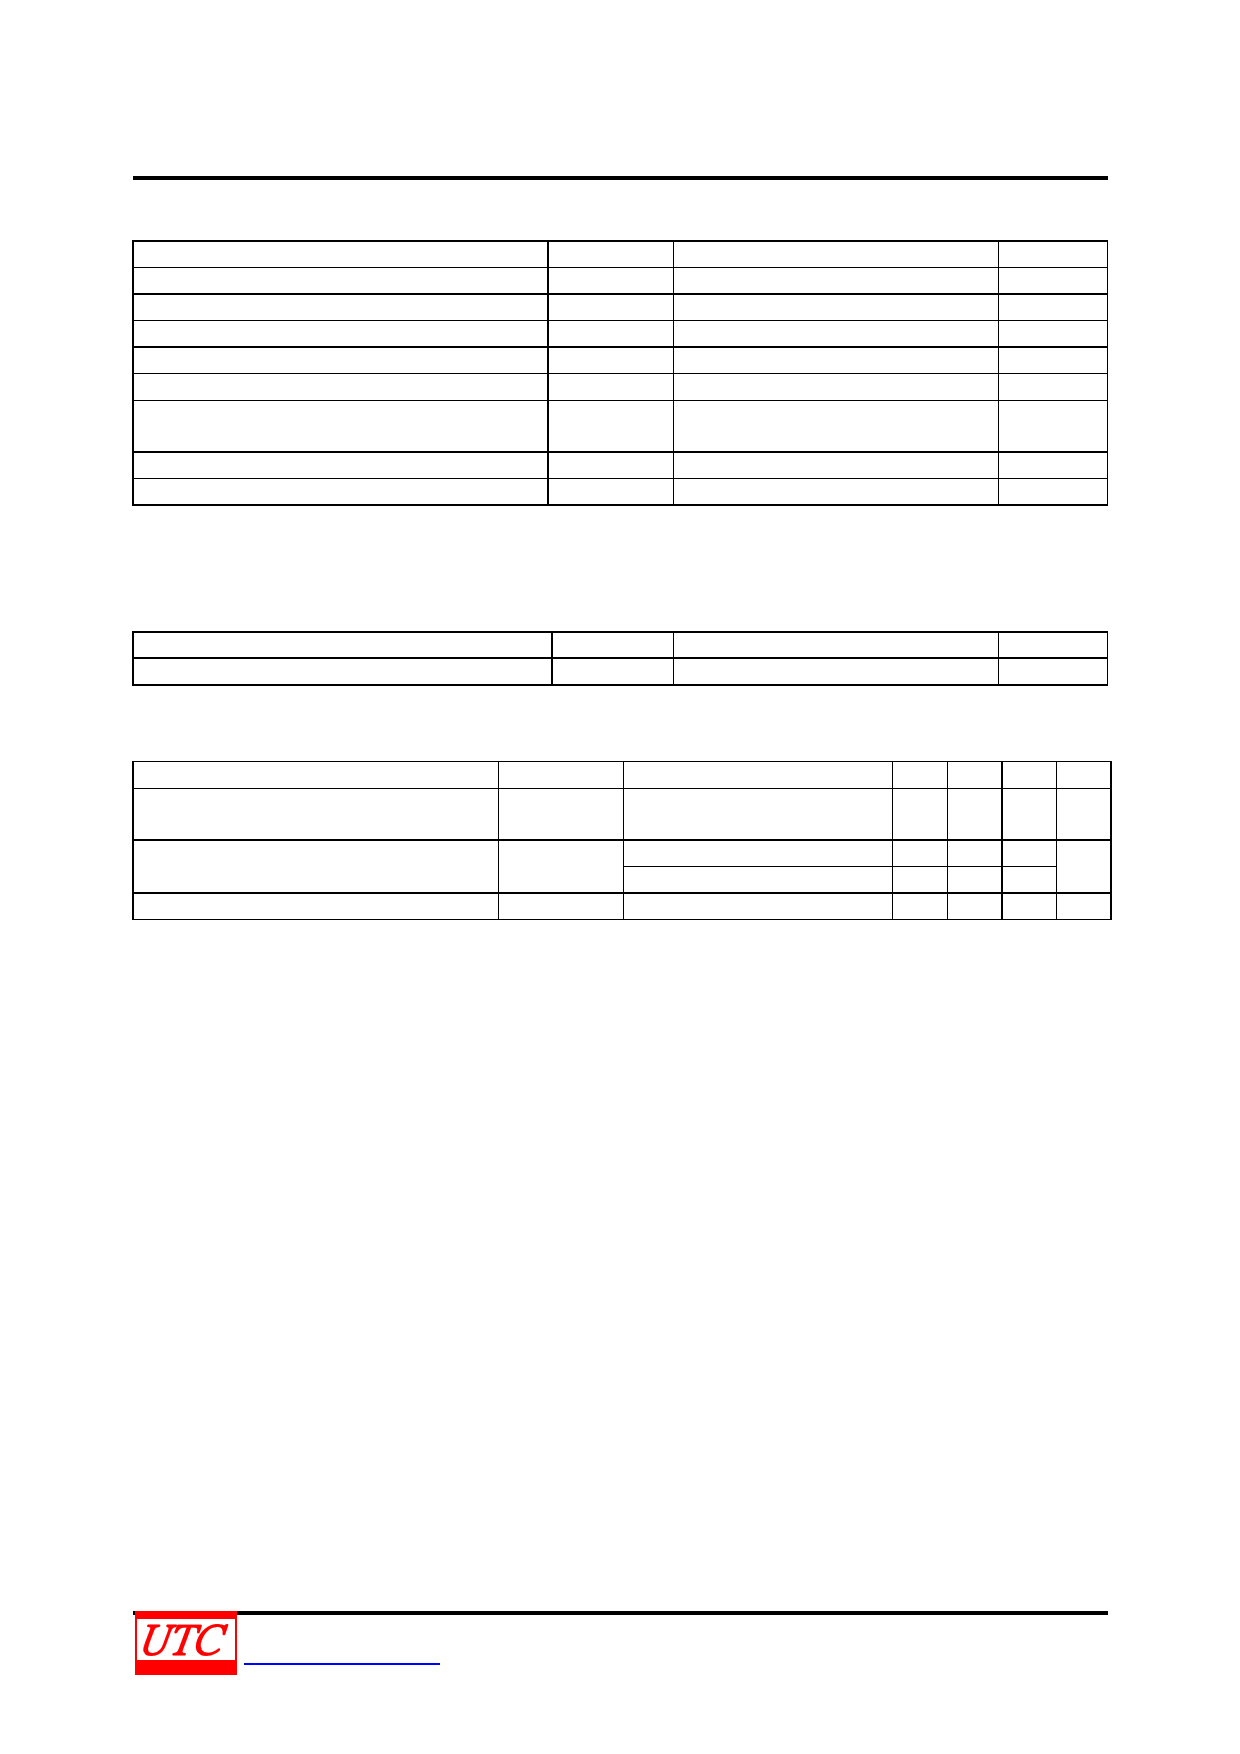 SK36 pdf, schematic